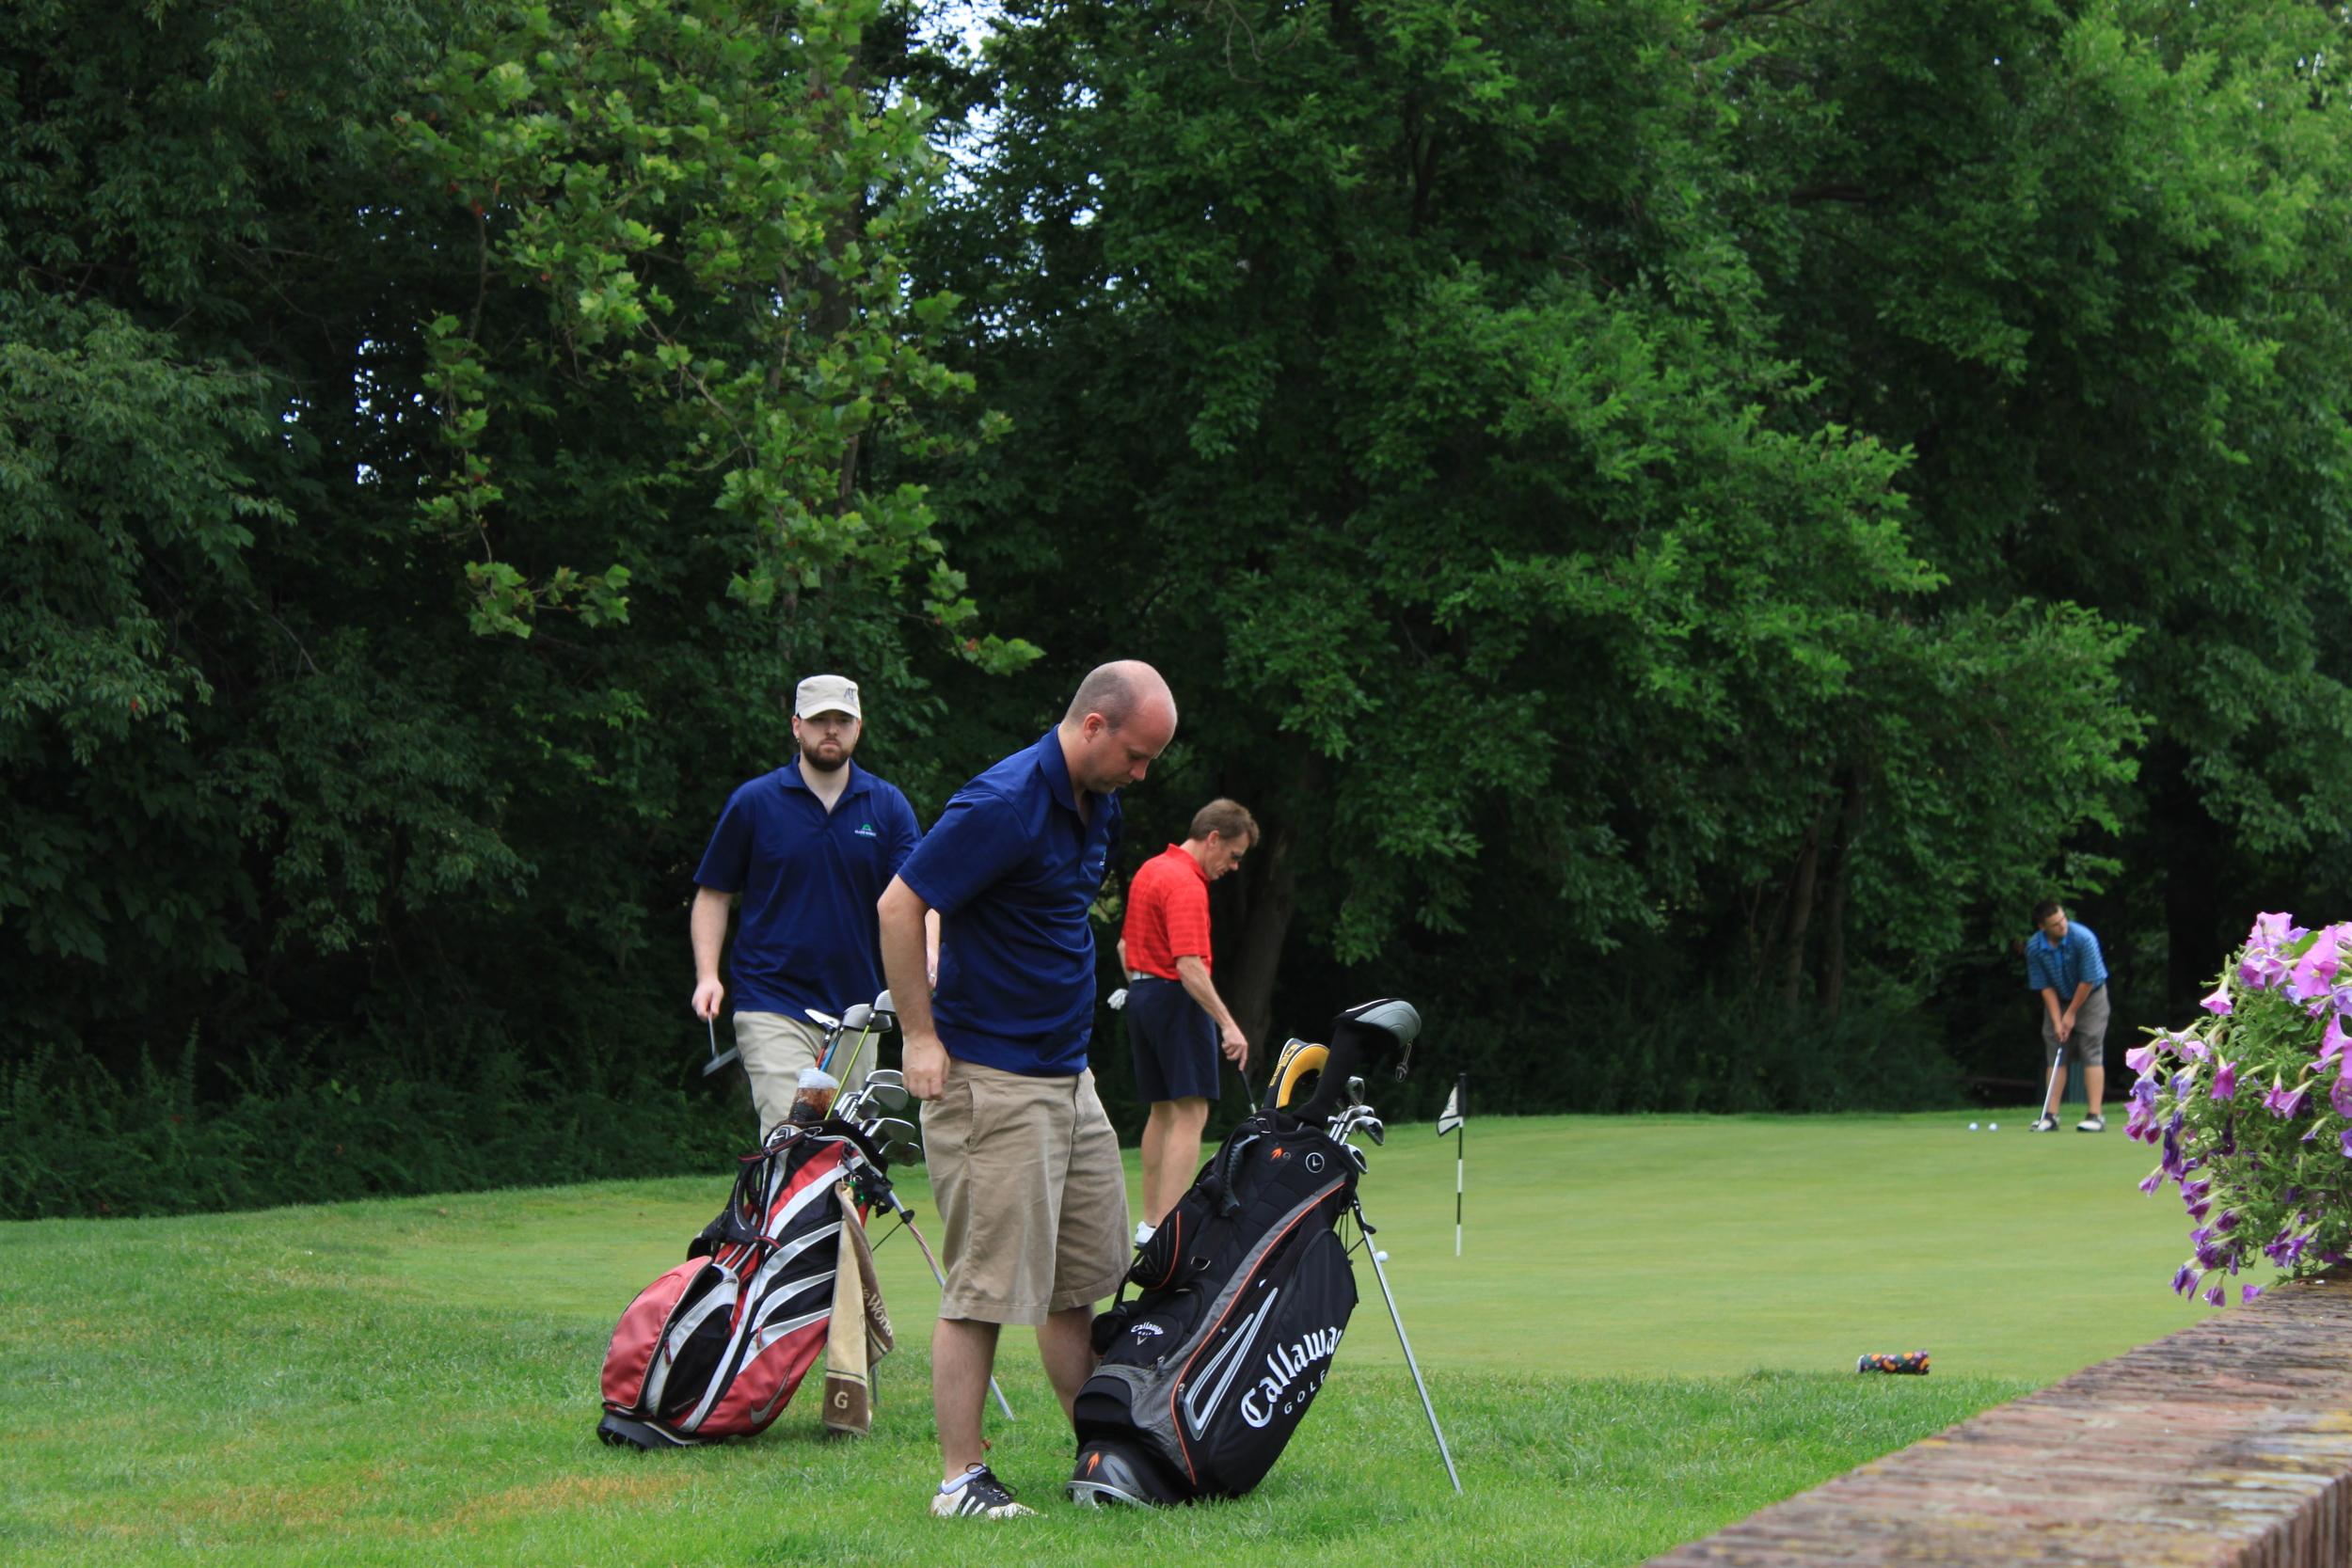 Dennis_Fitzgerald_Golf_Tournament_2011_IMG_3356.JPG